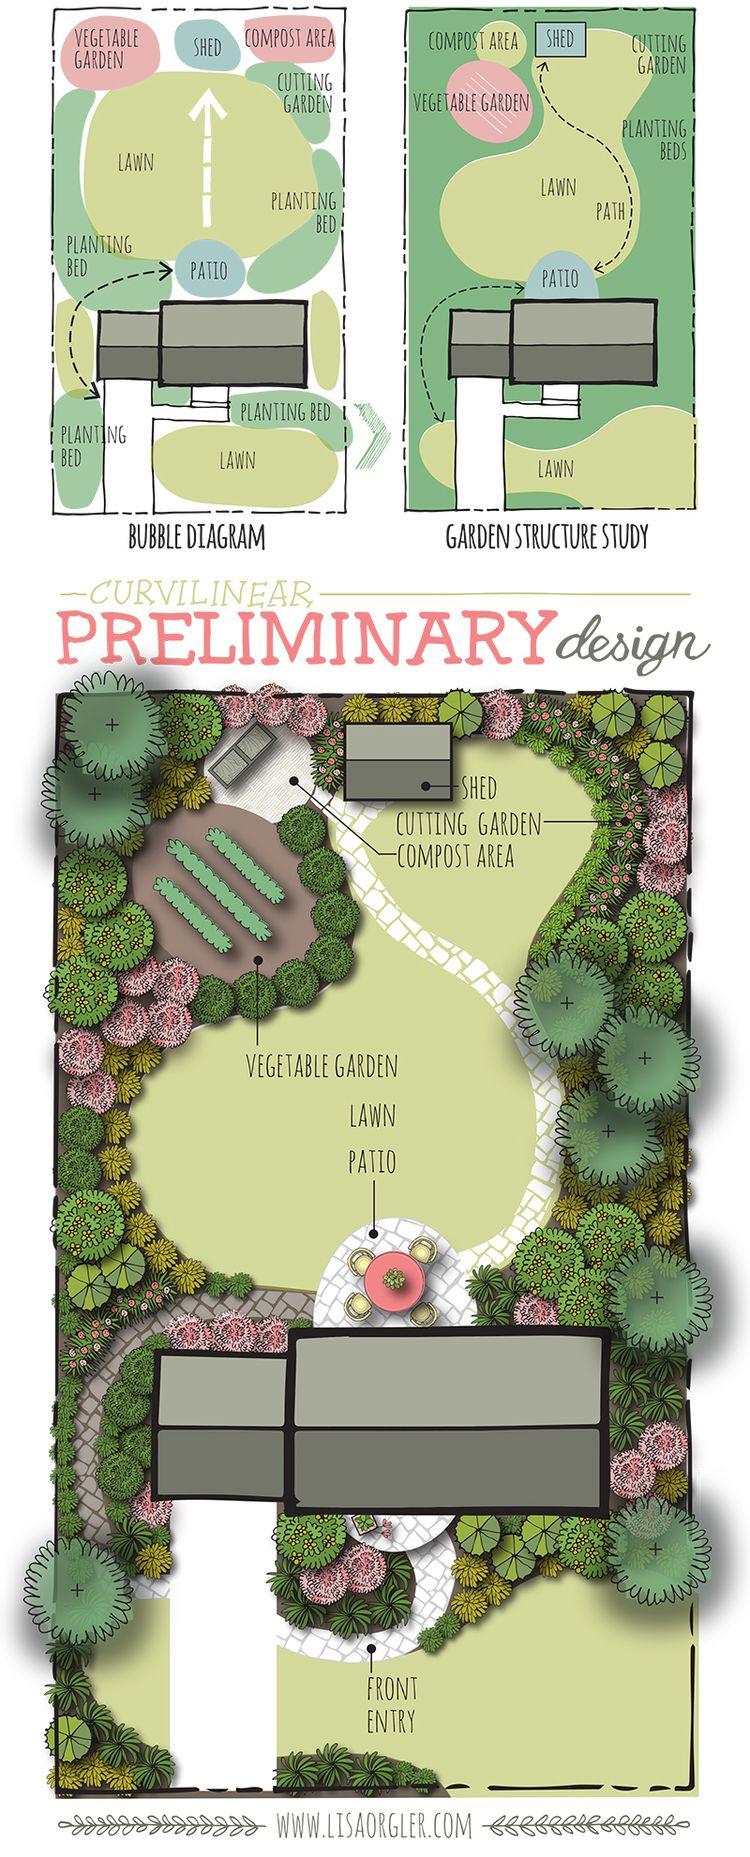 Simphome.com featuring 15 landscape design garden design and backyard